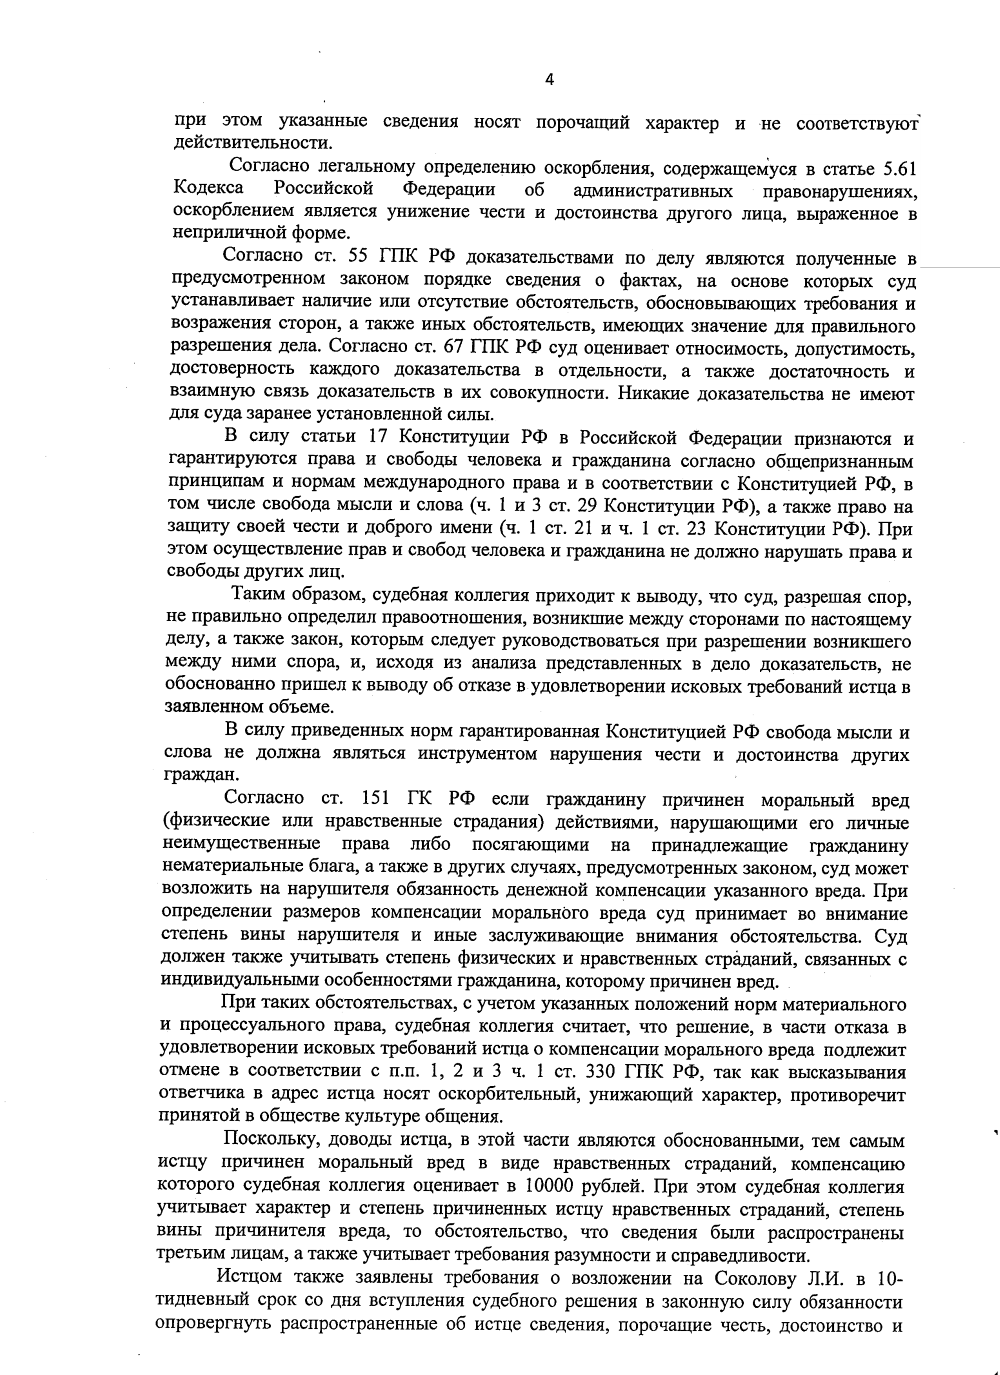 https://sontgranit.ru/forum/img/sokol/20180406-определениеВС-4.png